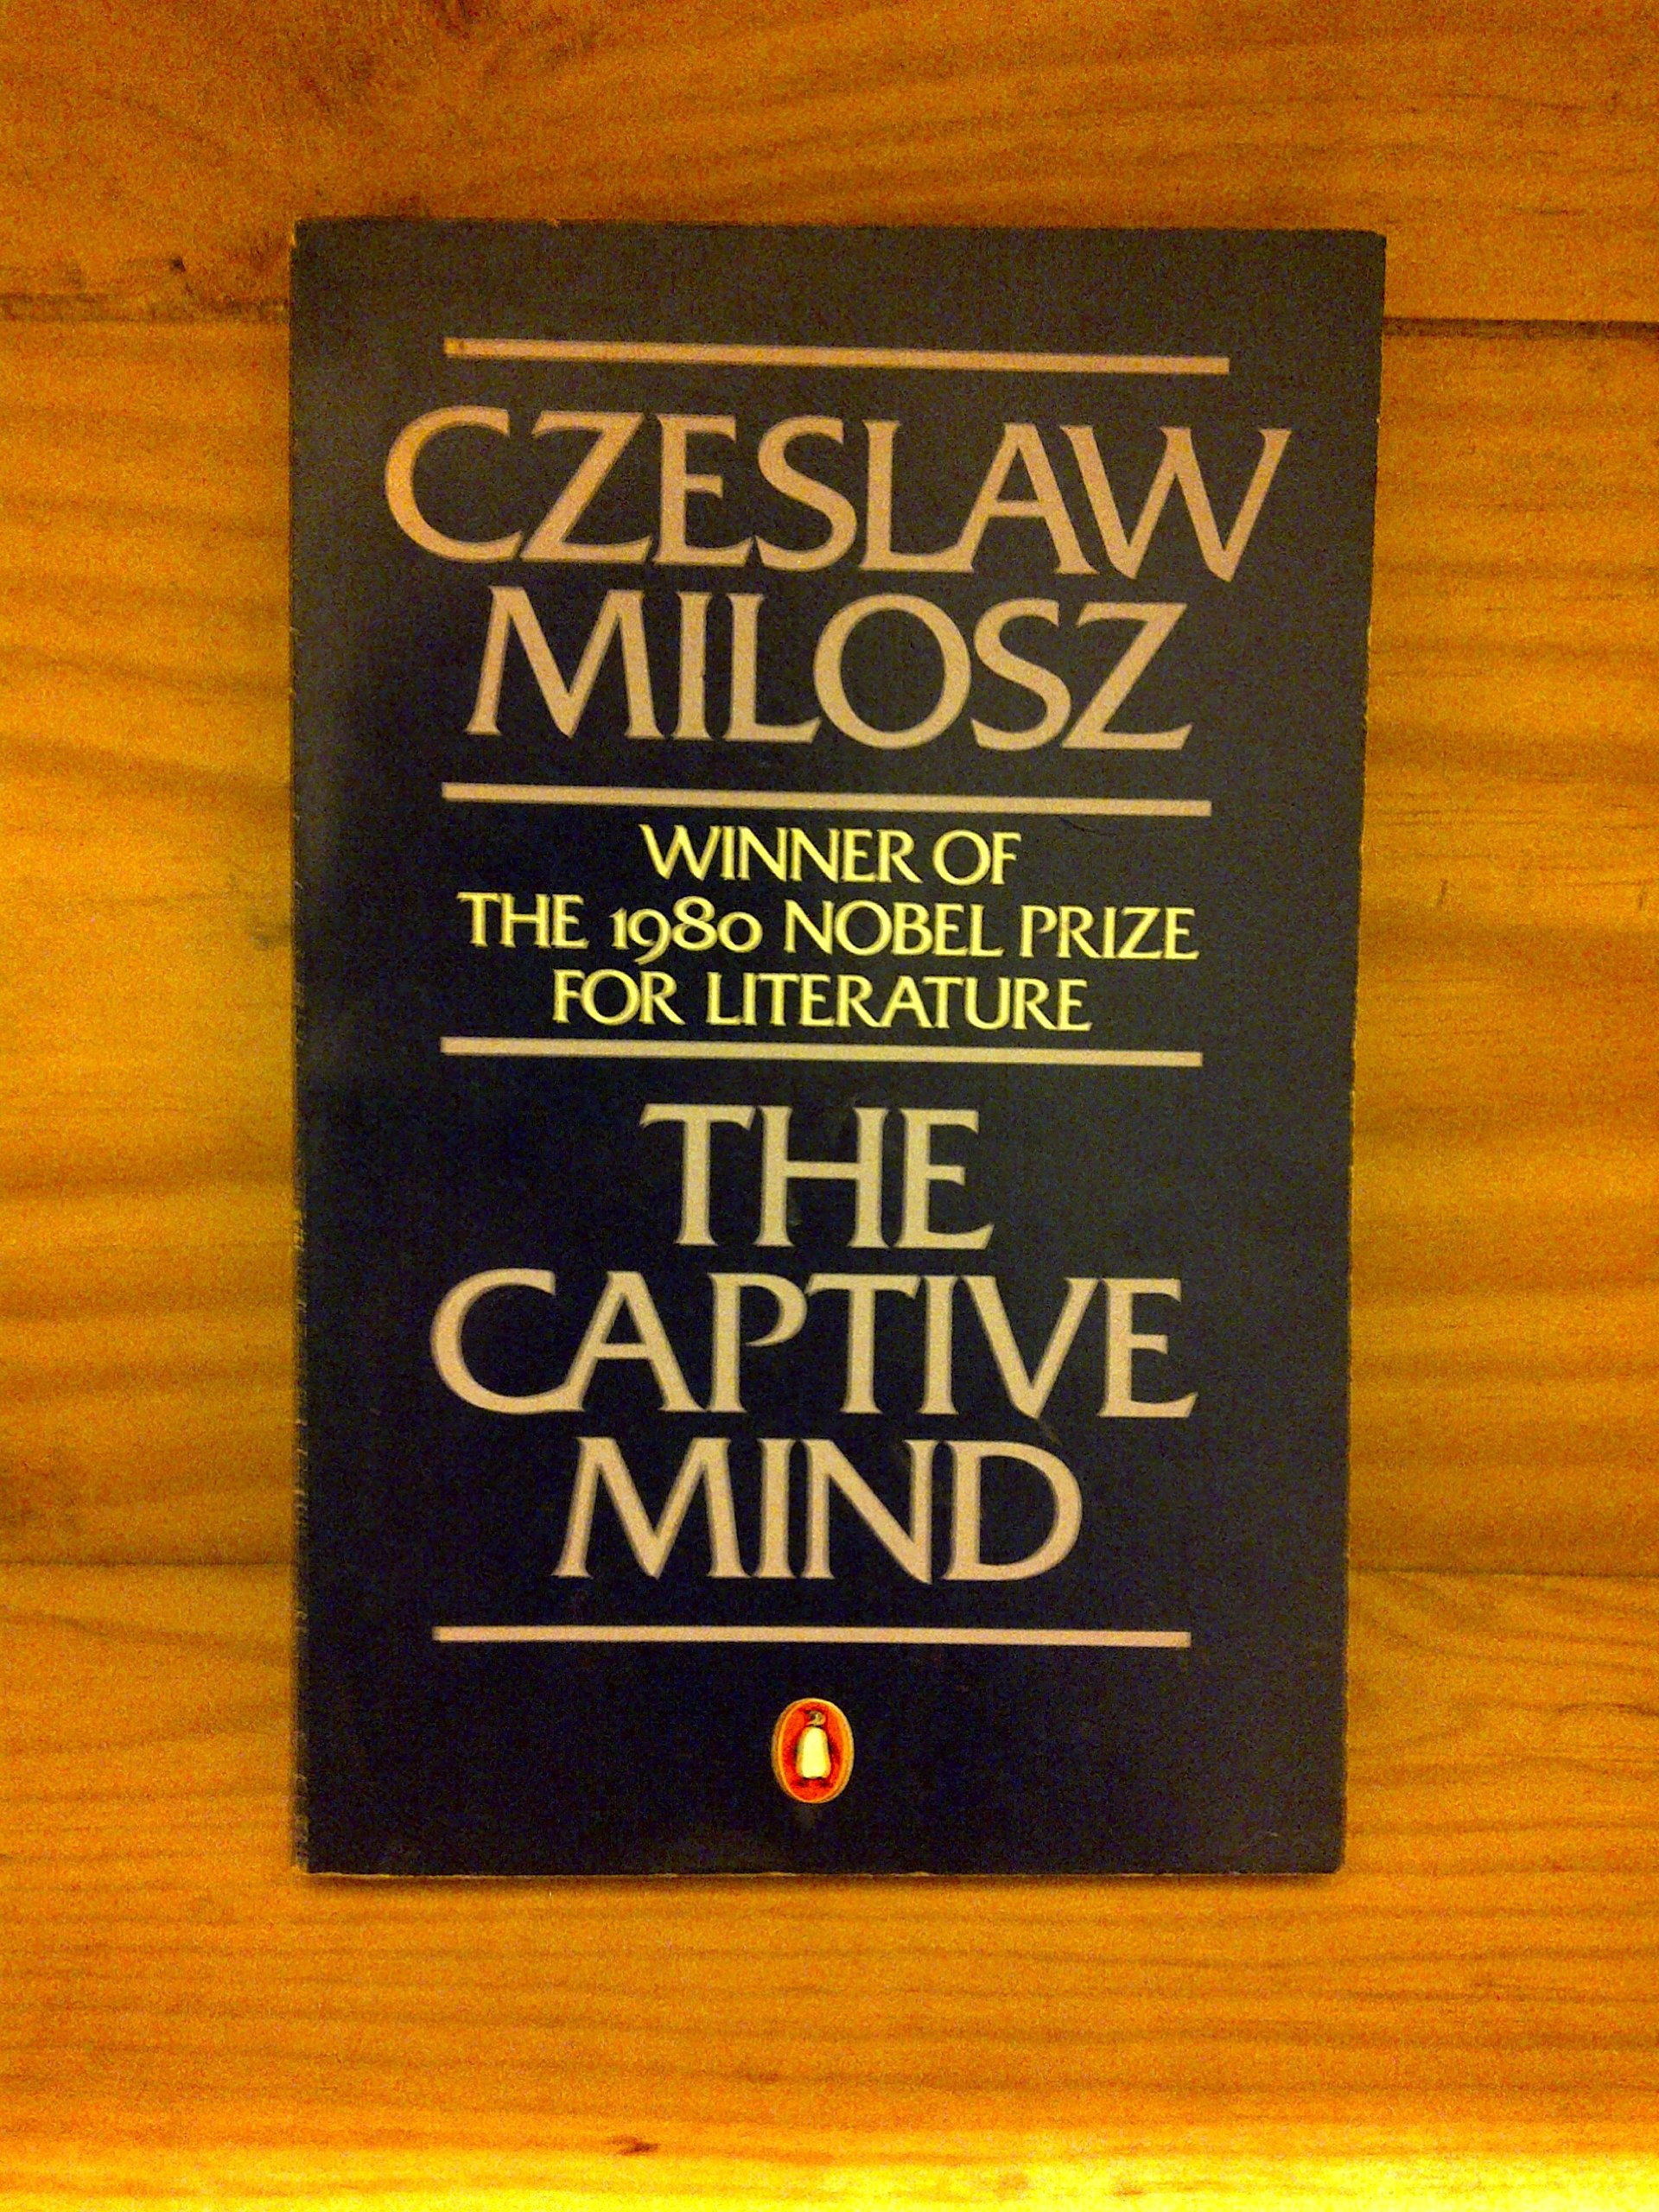 czeslaw milosz the captive mind